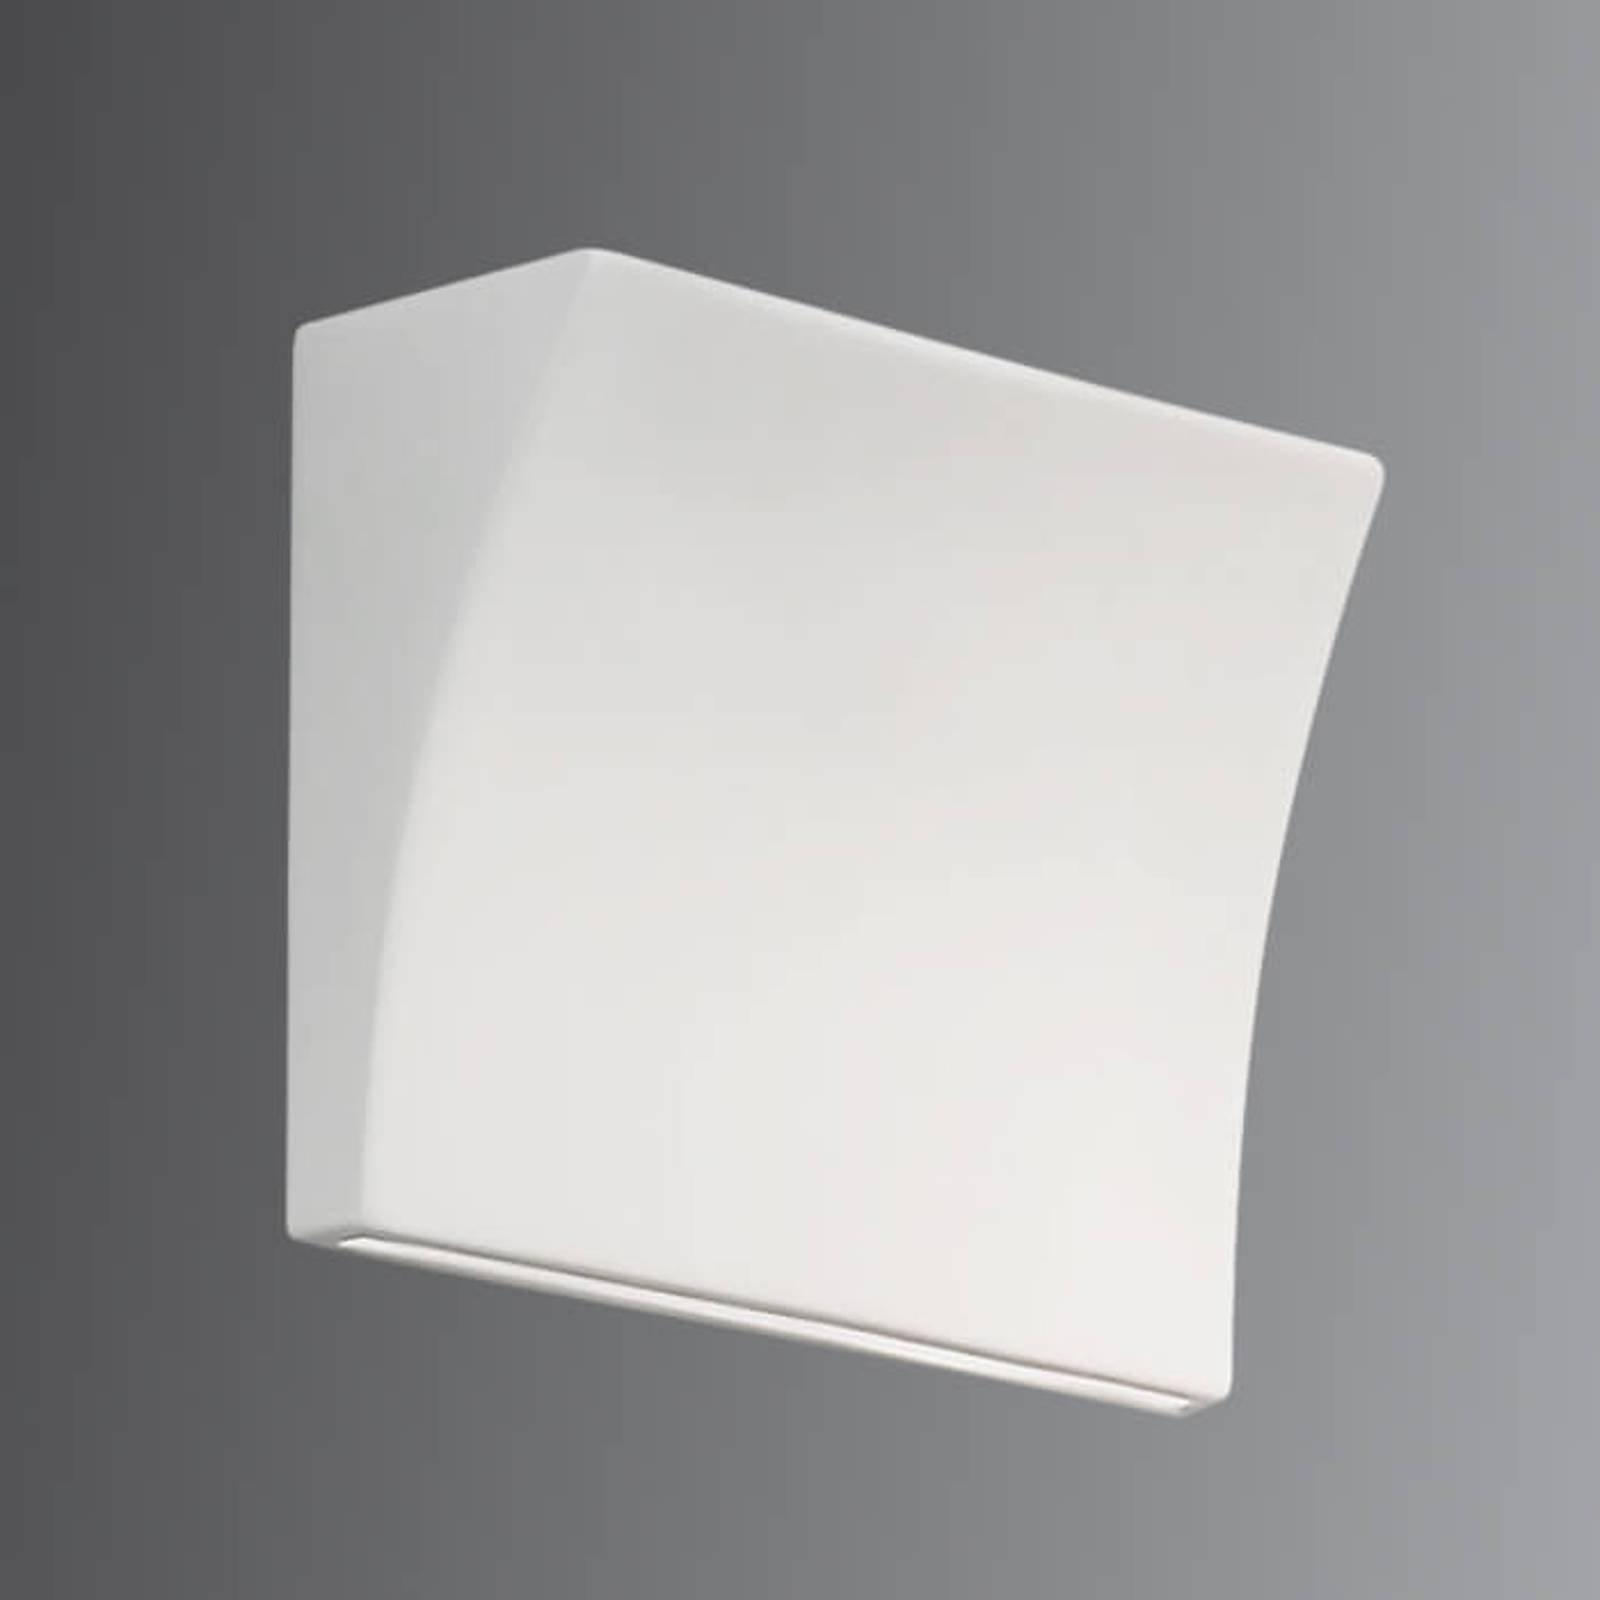 Design-vegglampe Delon H 17cm/ B: 18 cm